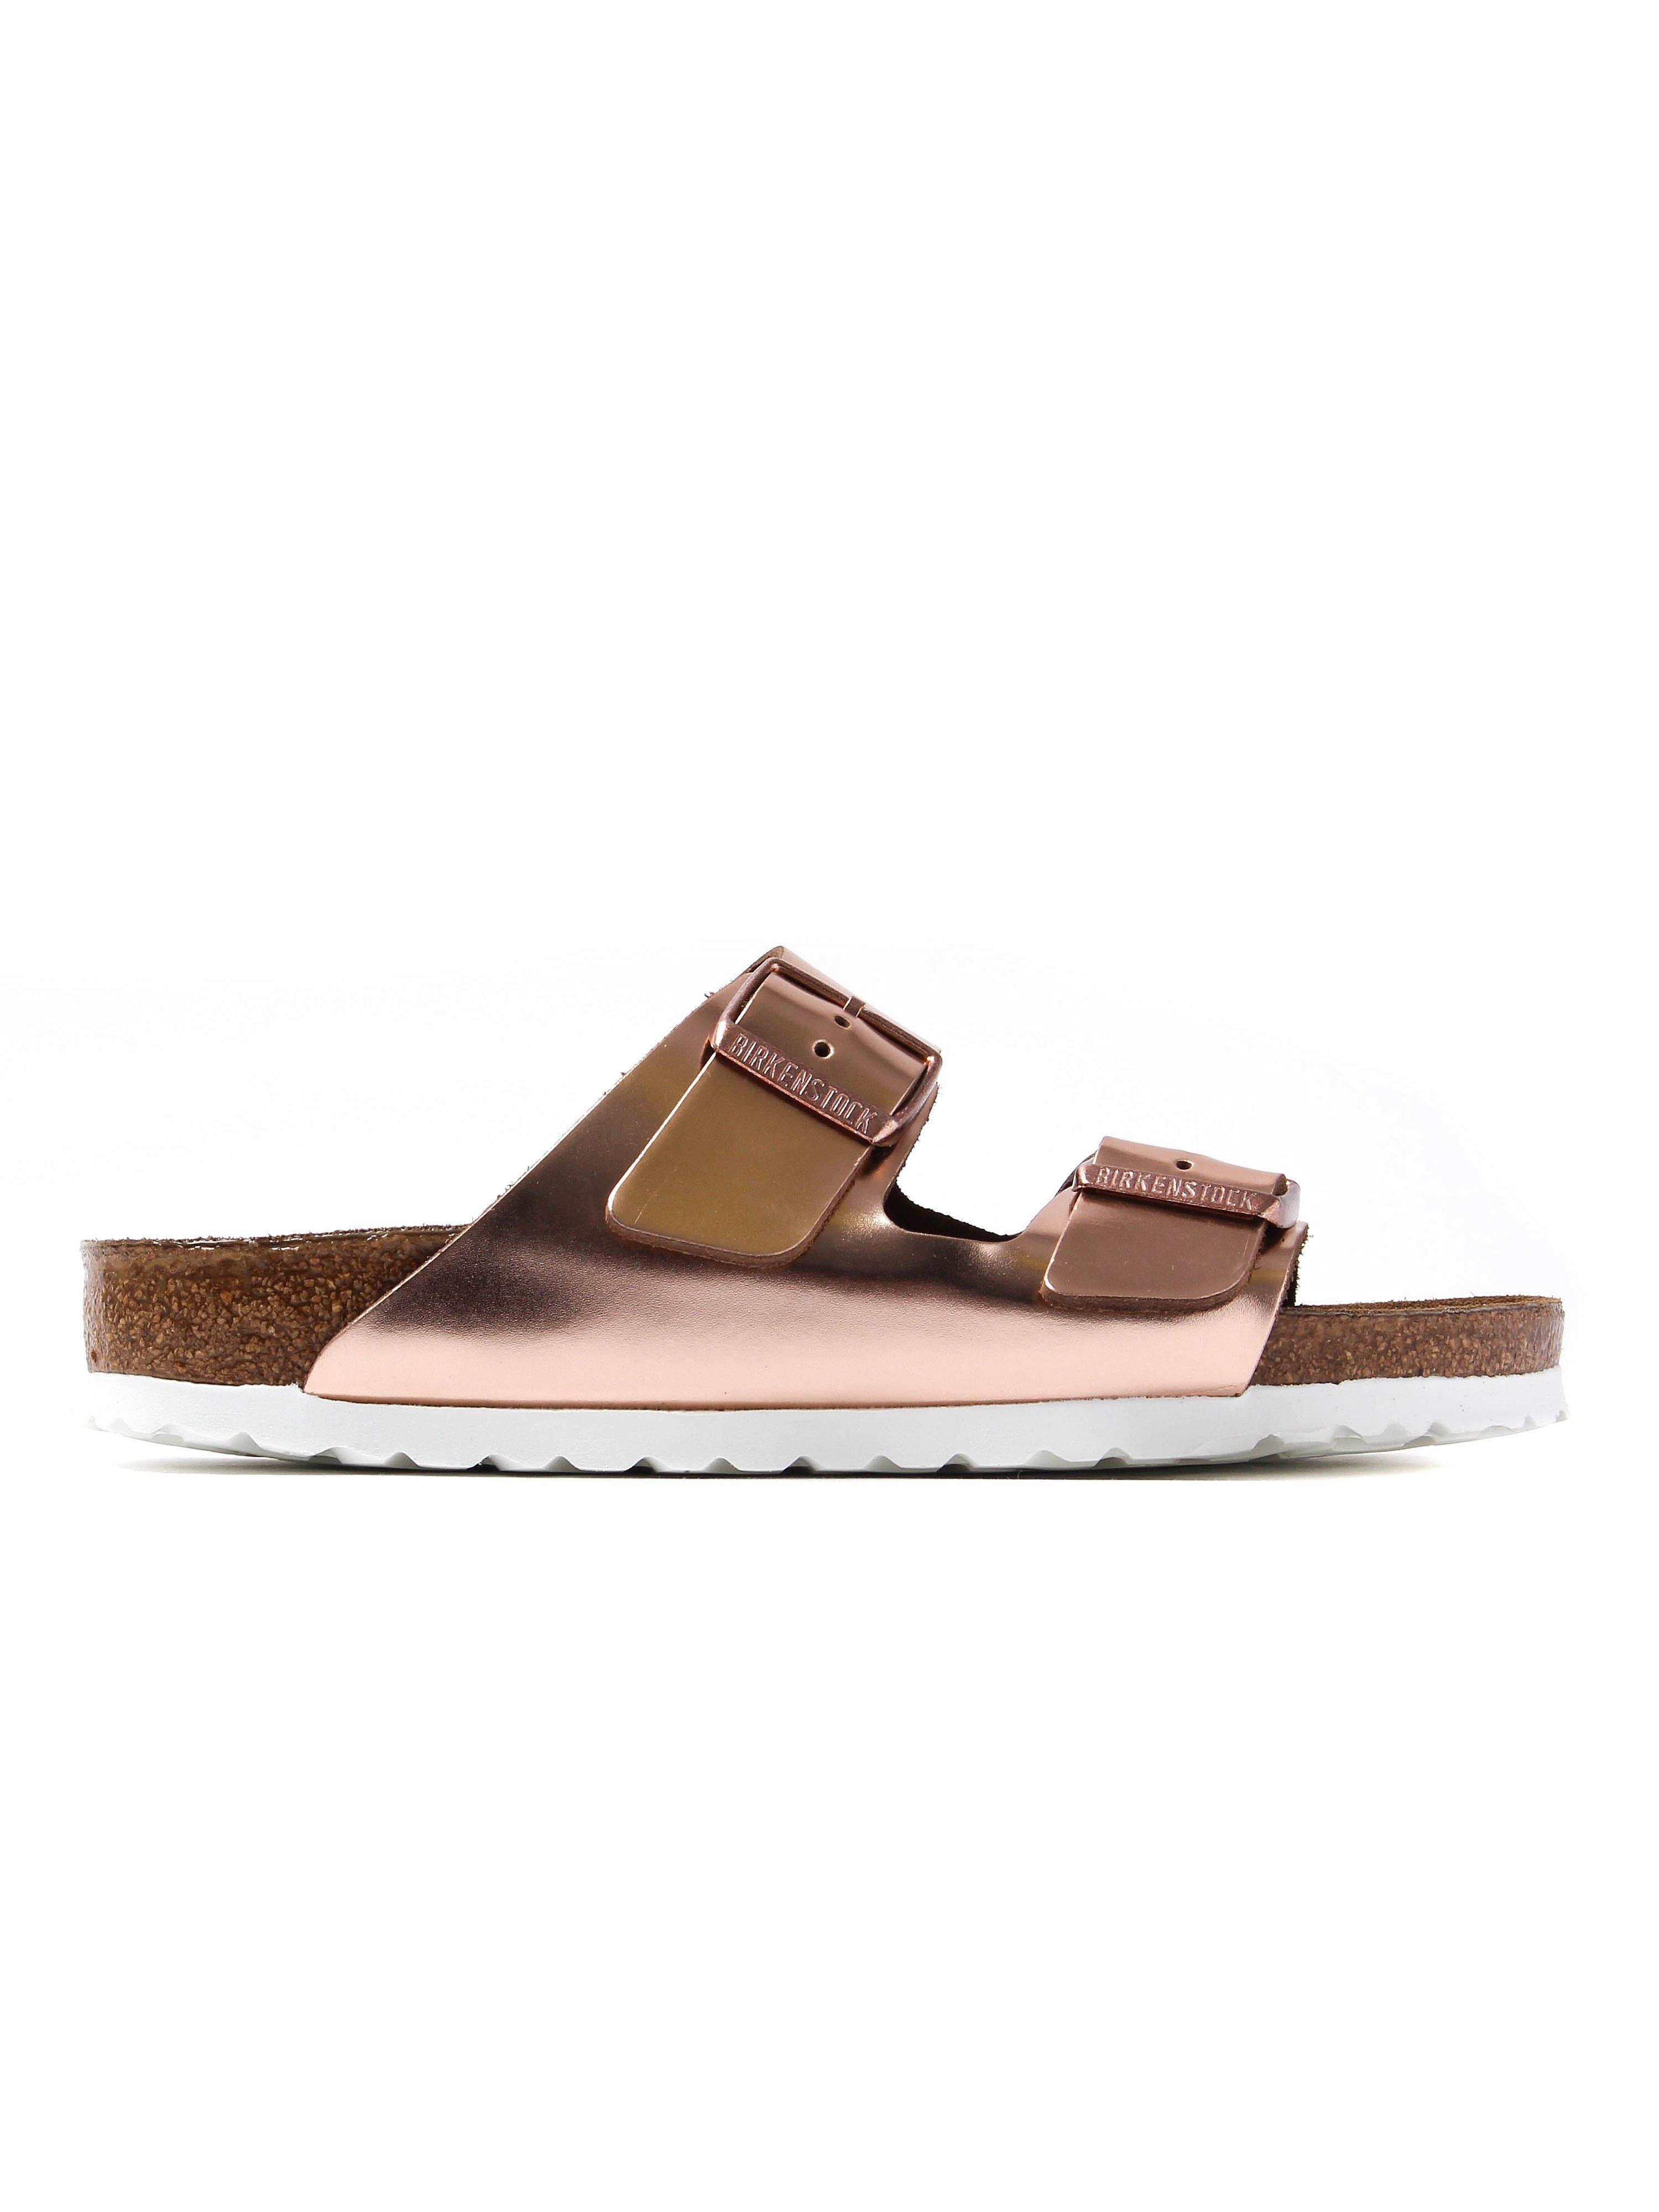 Birkenstock Women's Arizona Narrow Fit Sandals - Metallic Copper Leather